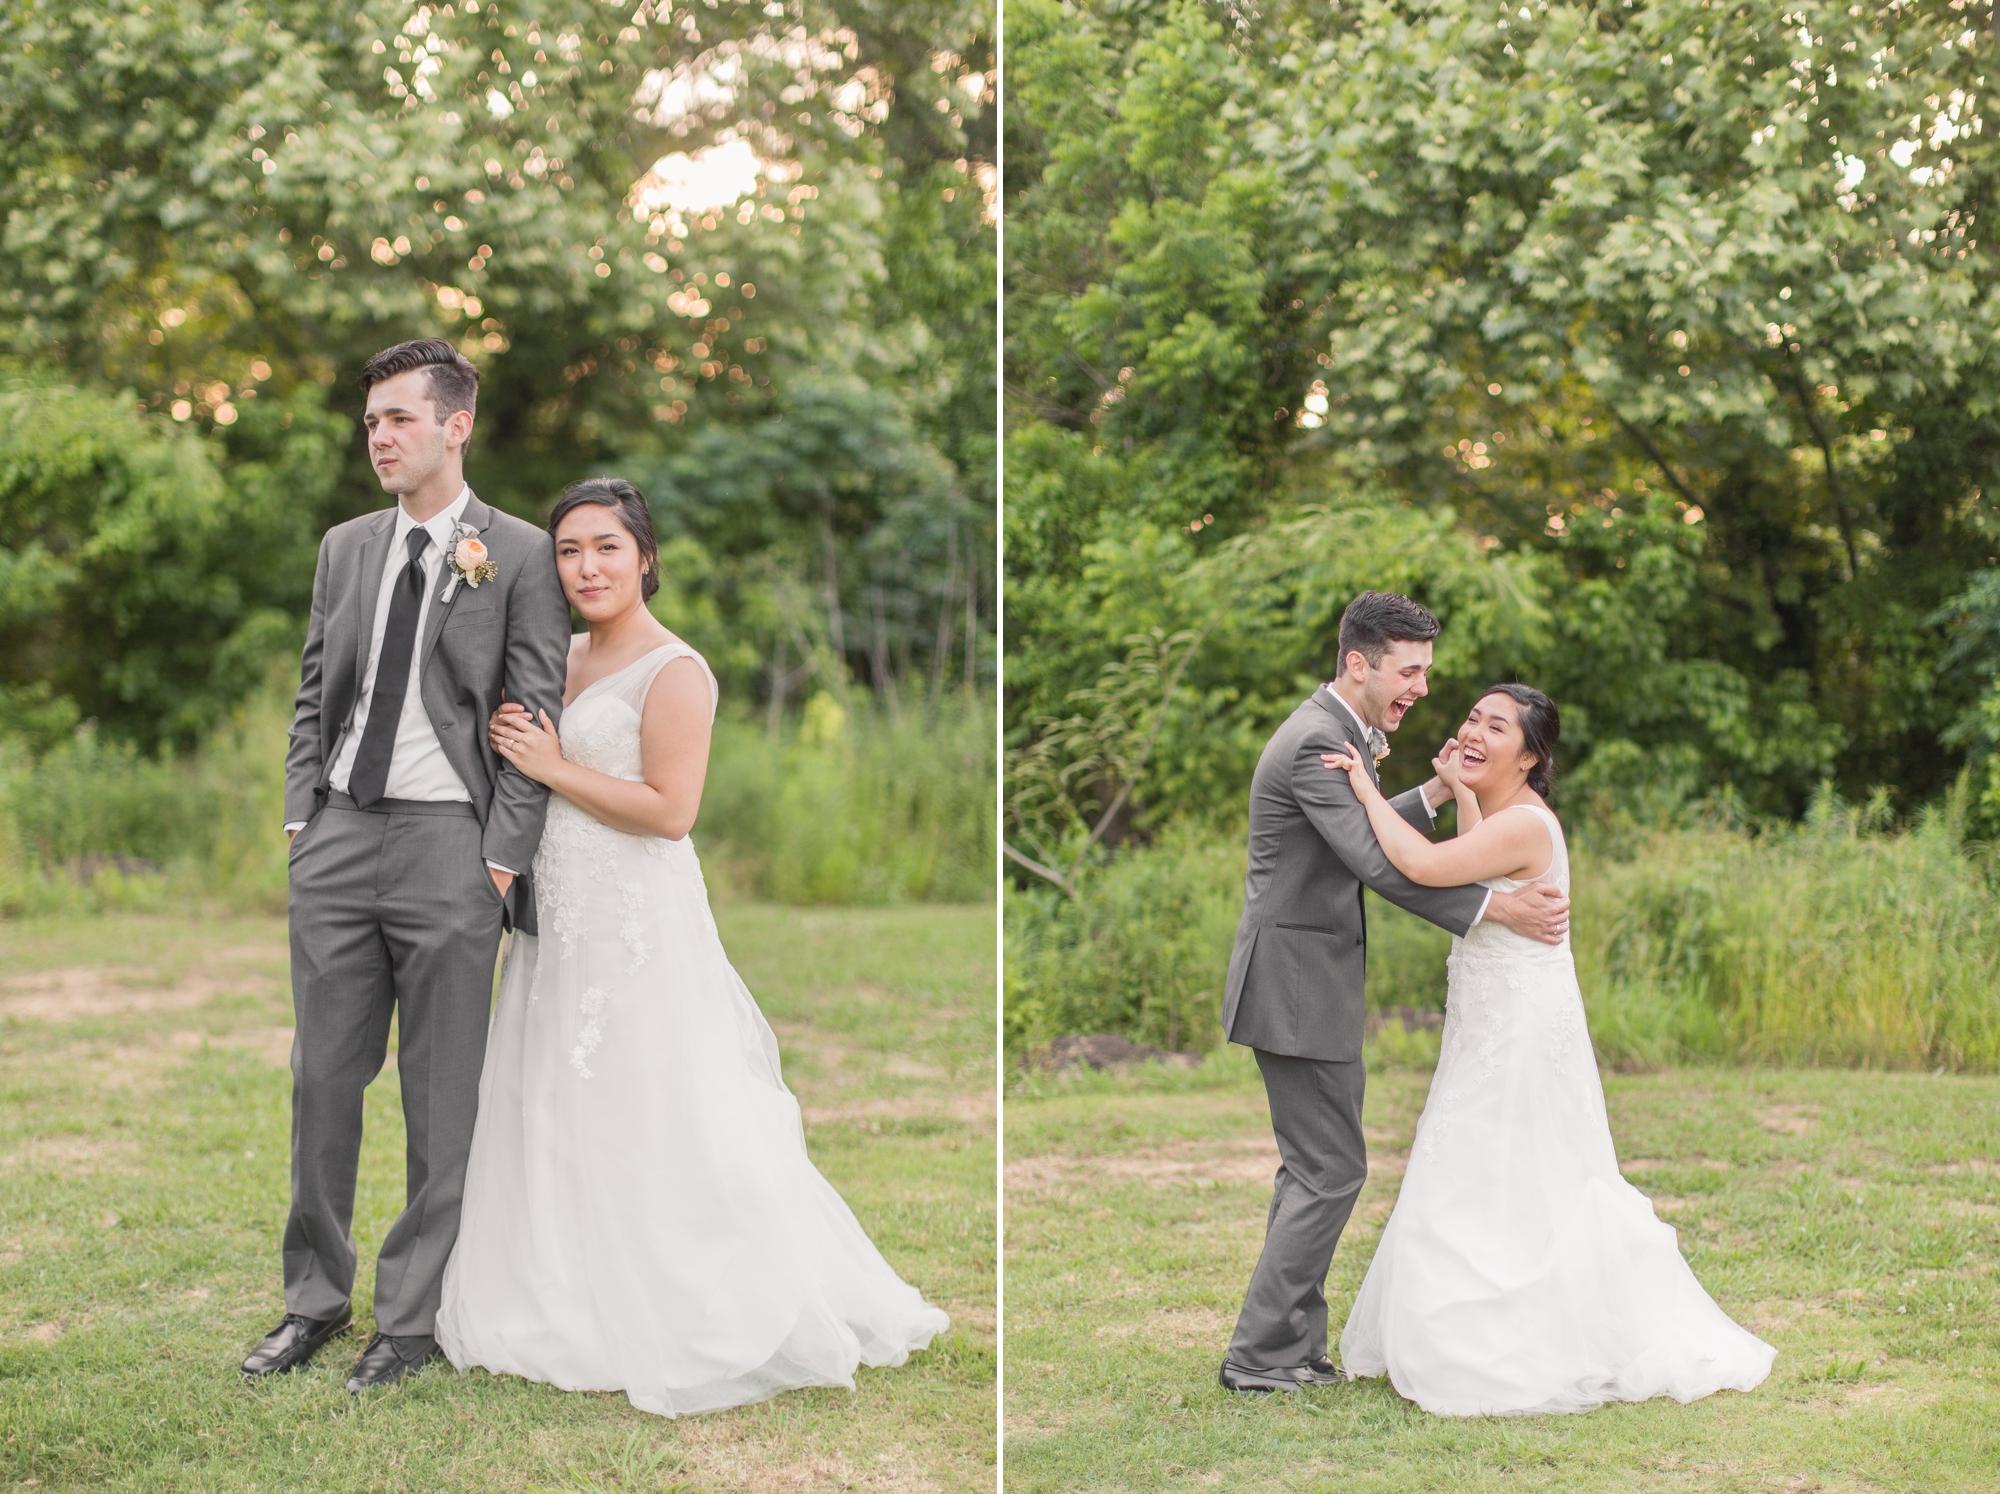 giles wedding blog 41.jpg